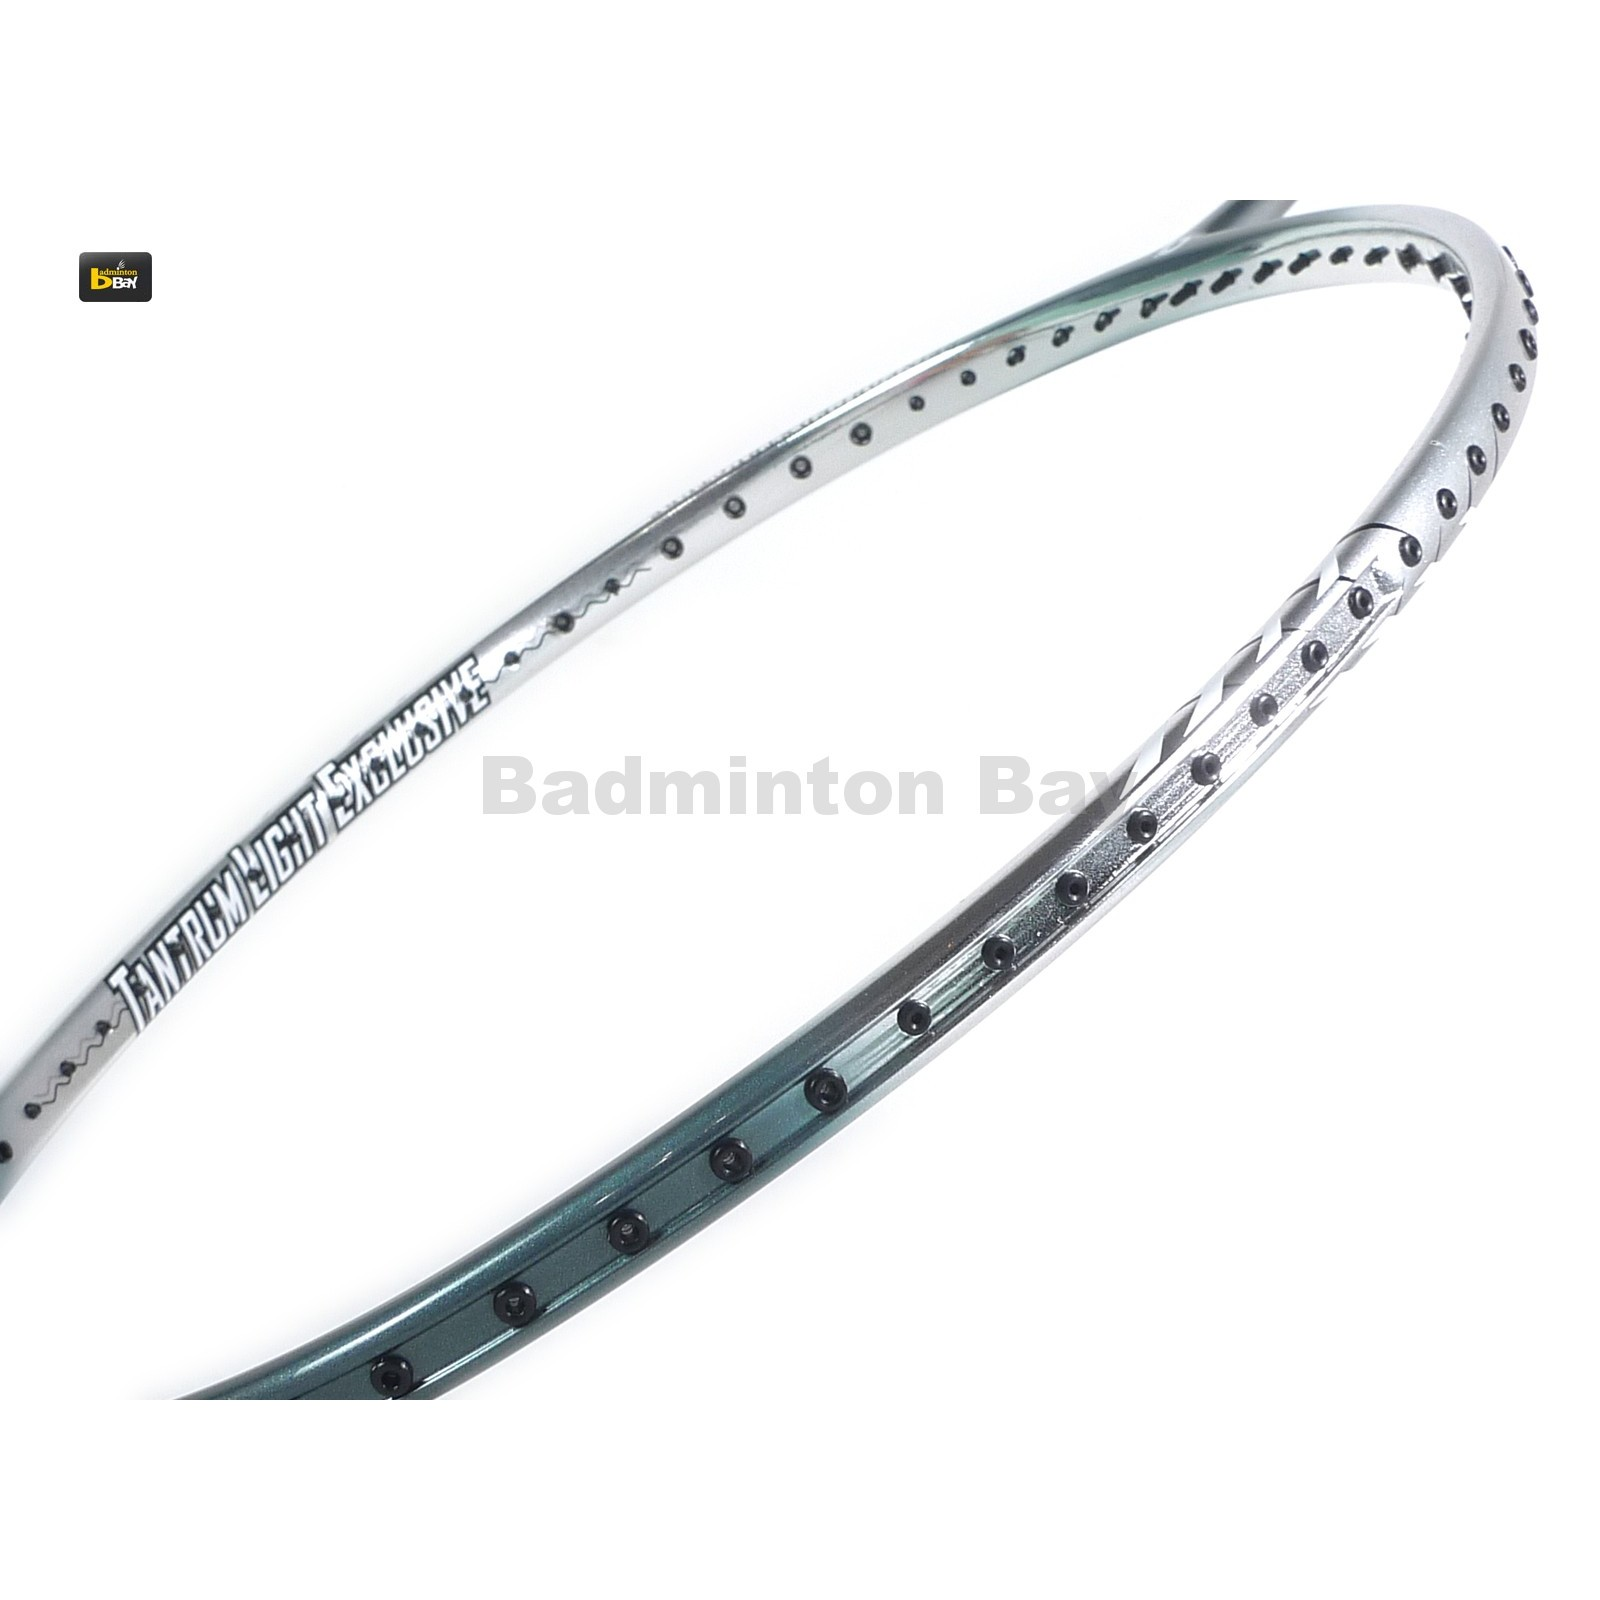 Apacs Tantrum Light Exclusive Badminton Racket